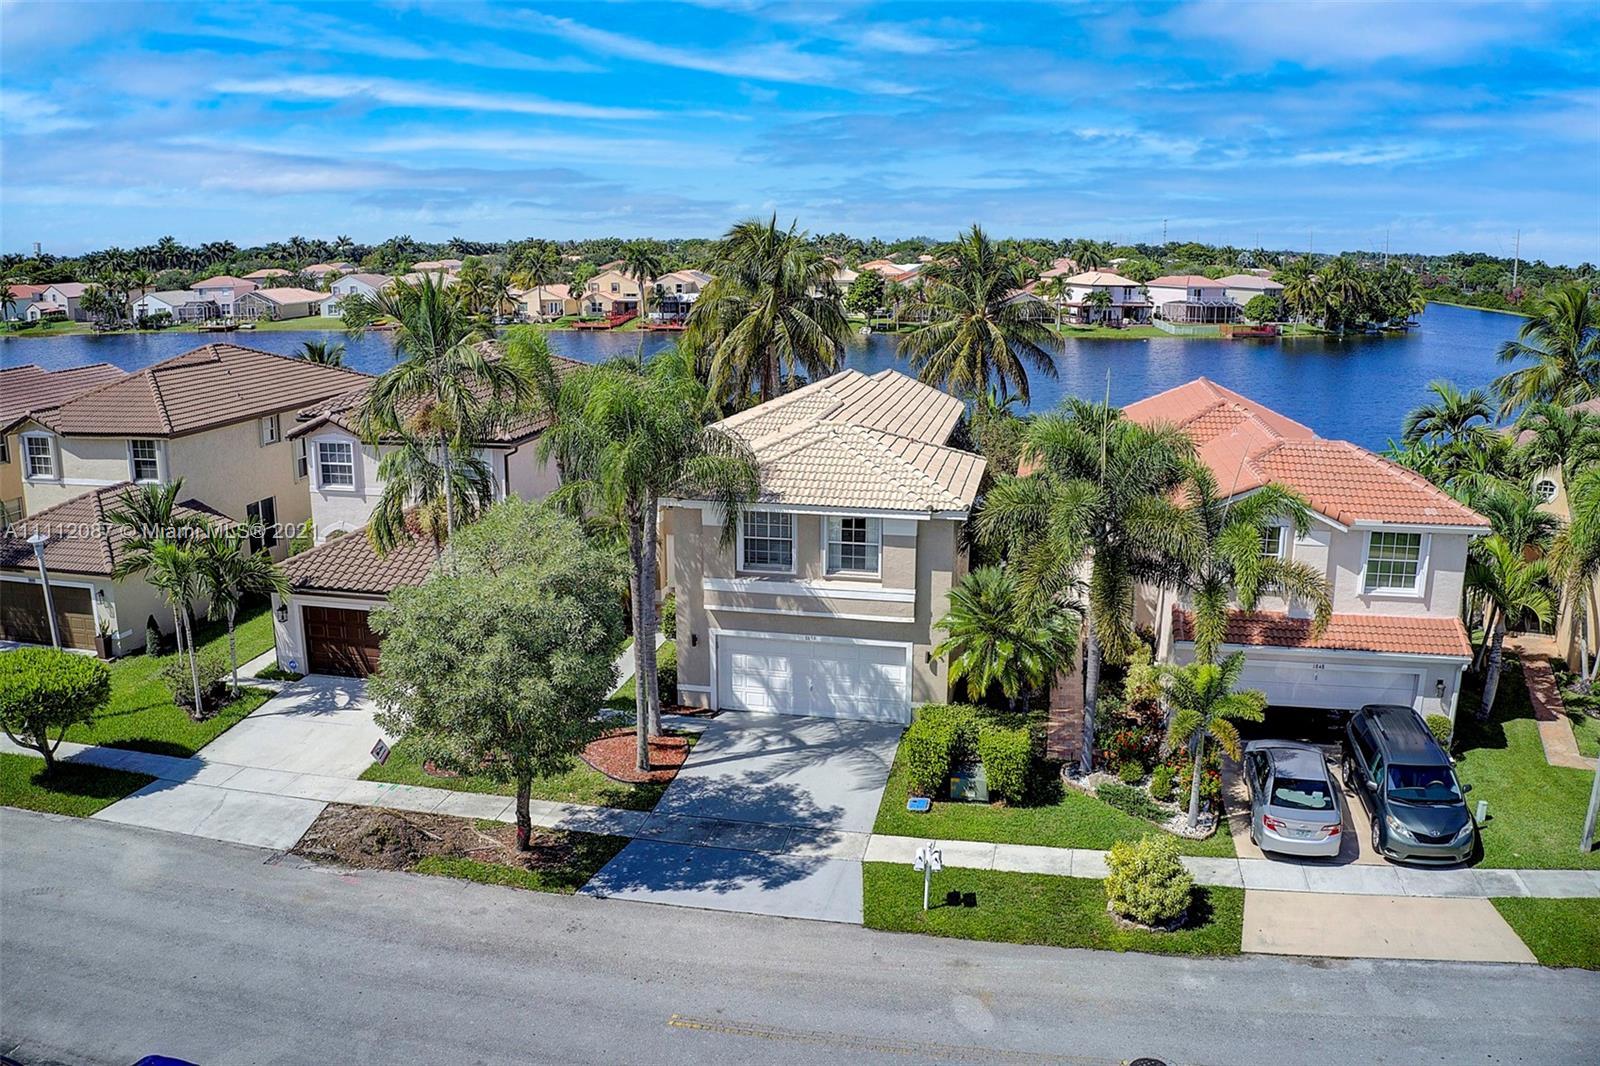 Silver Lakes - 1858 SW 175th Ave, Miramar, FL 33029